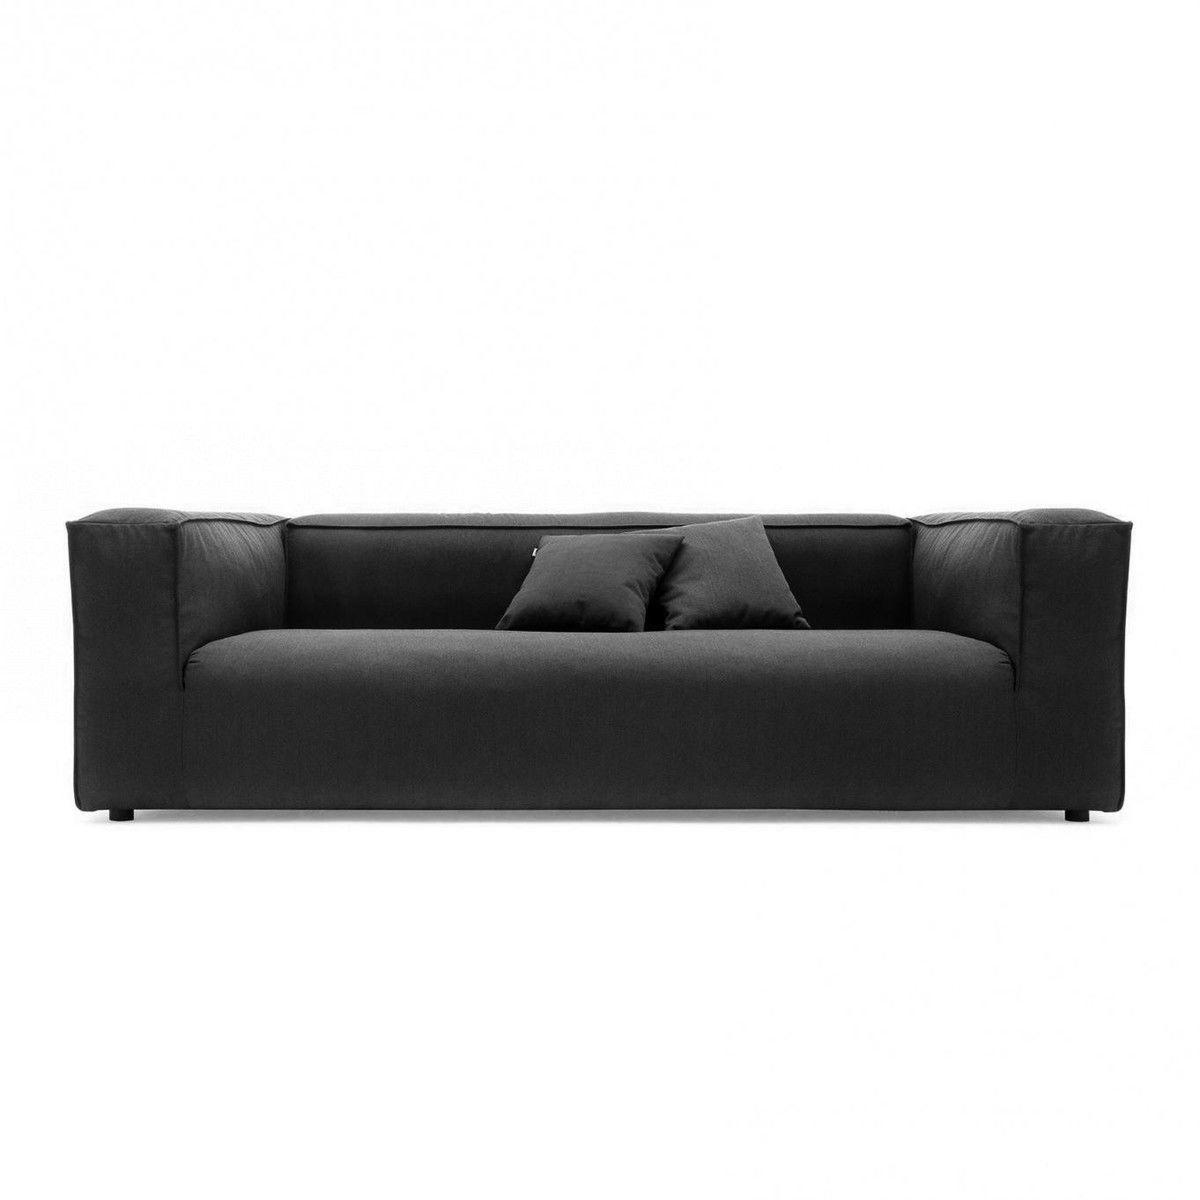 Freistil 175 3 sitzer sofa freistil rolf benz for Sofa ohne kissen